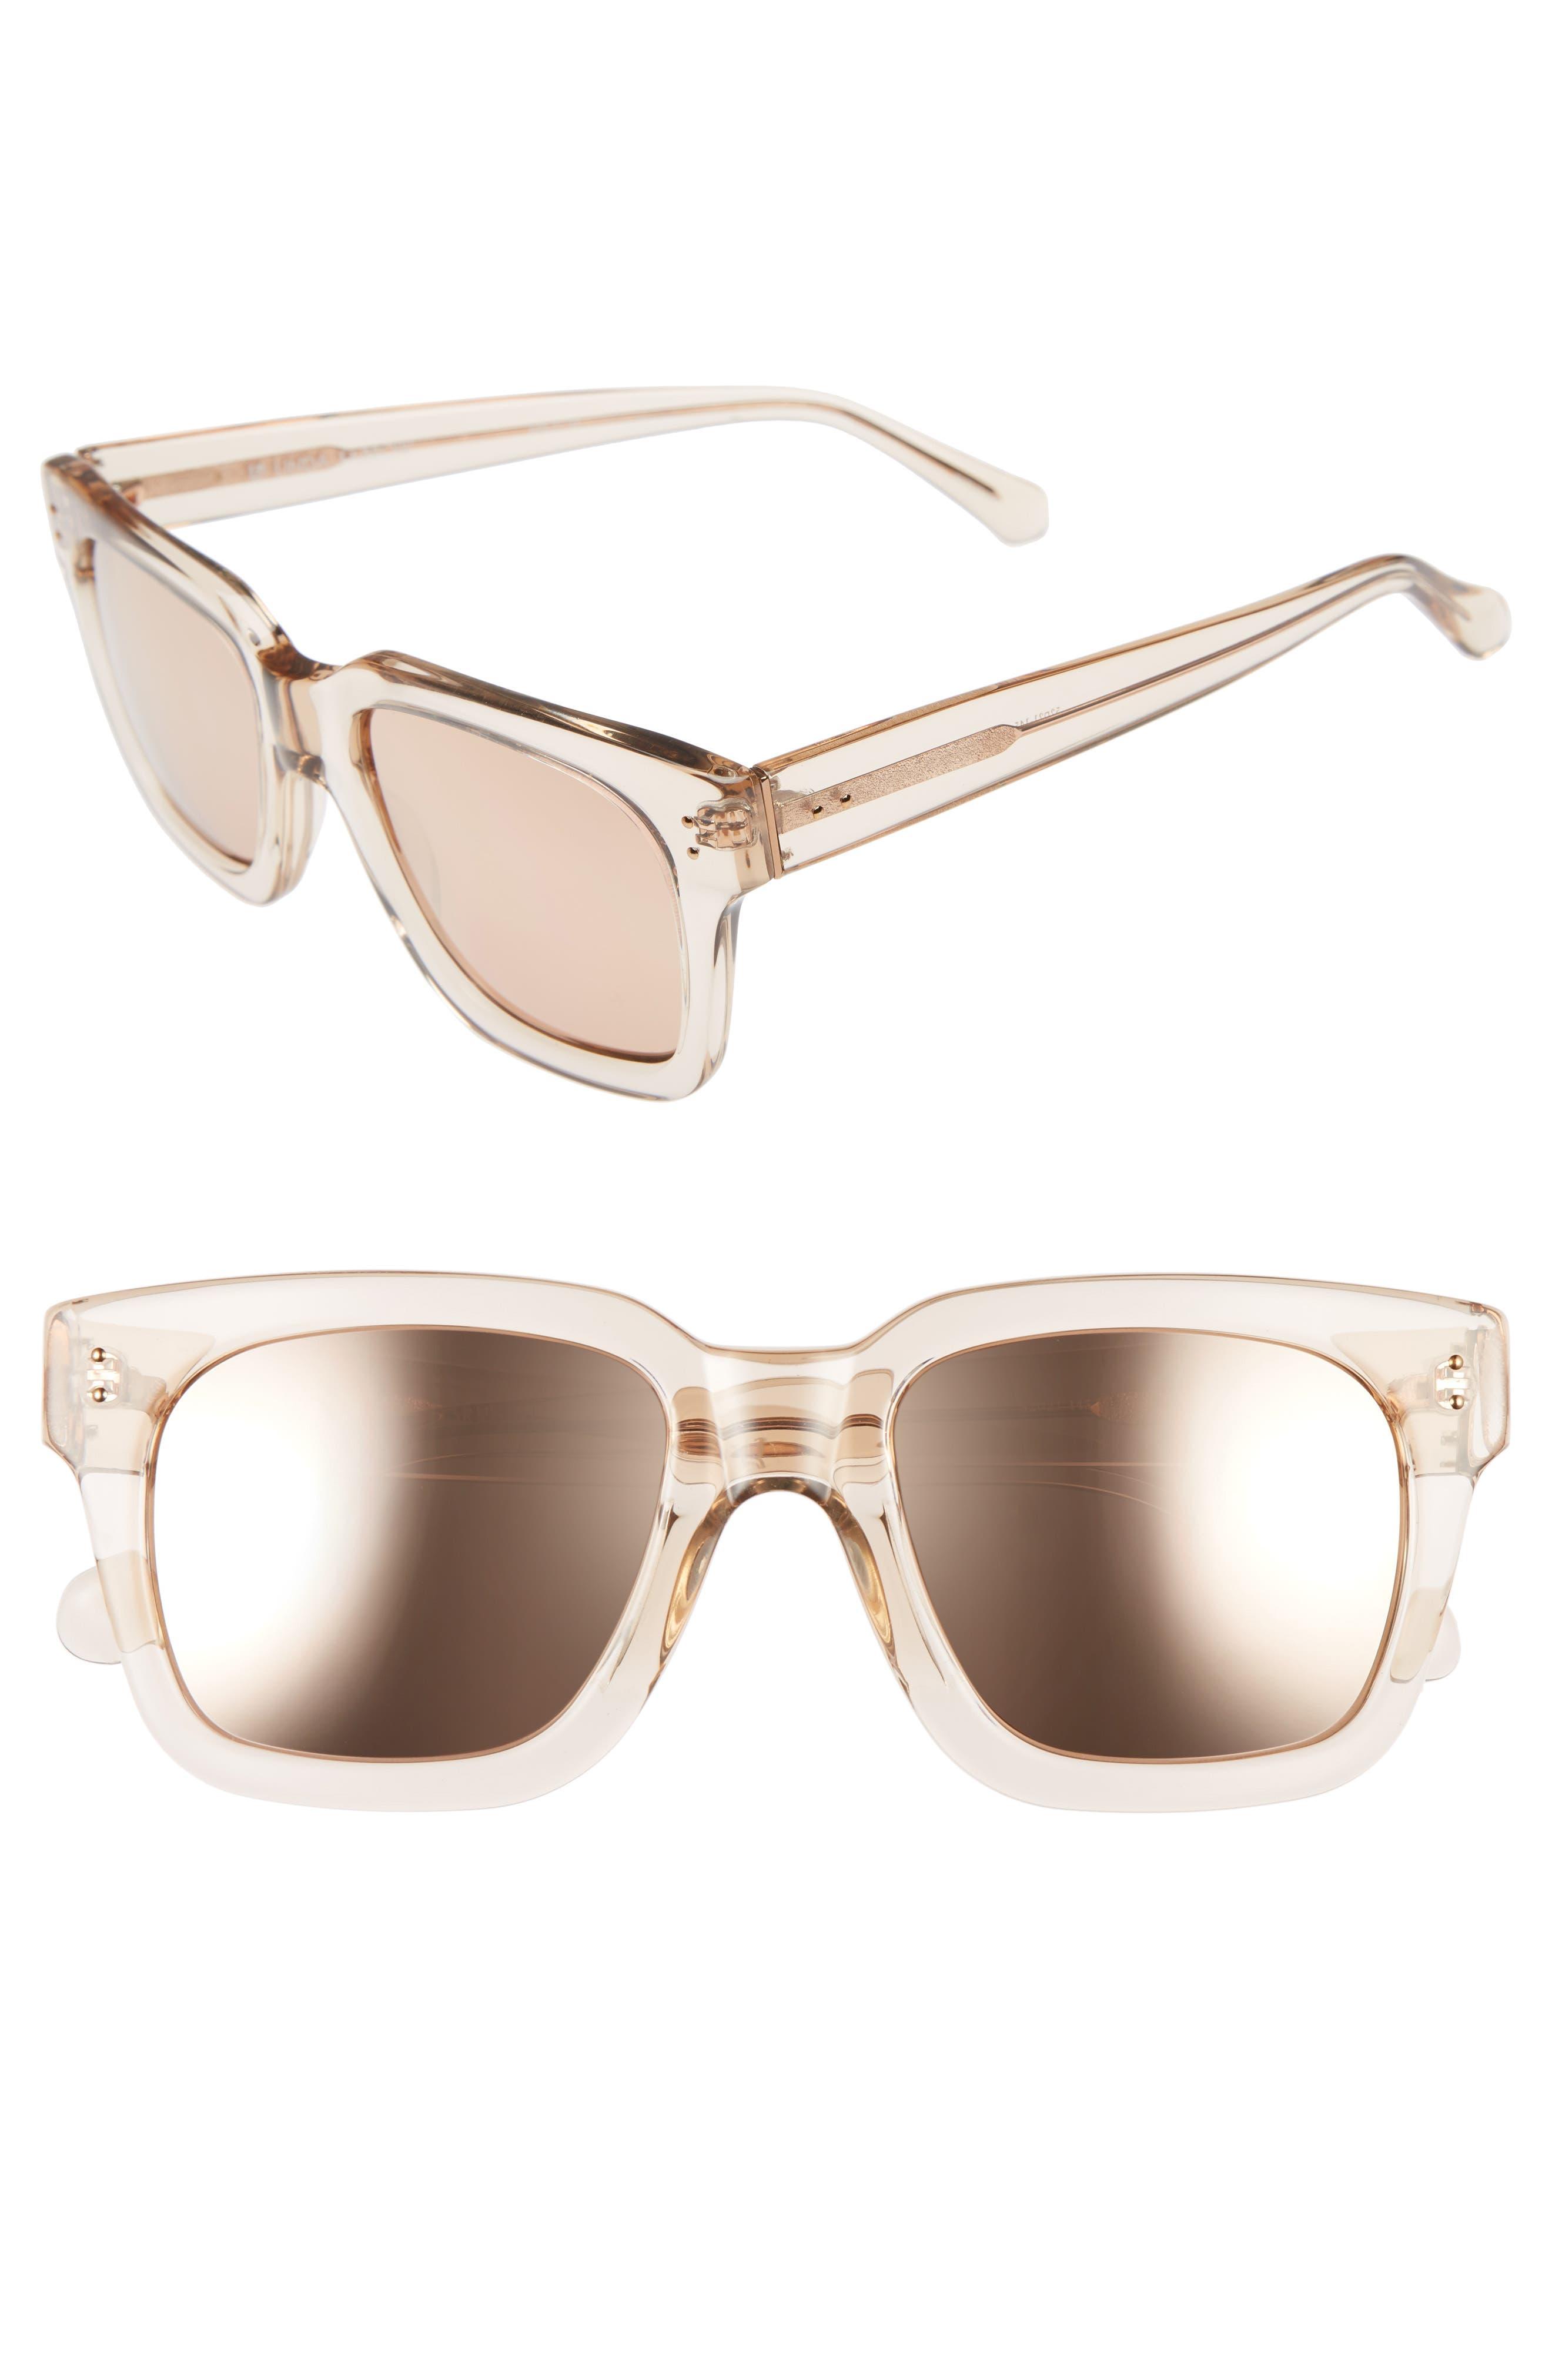 Linda Farrow 50mm Sunglasses